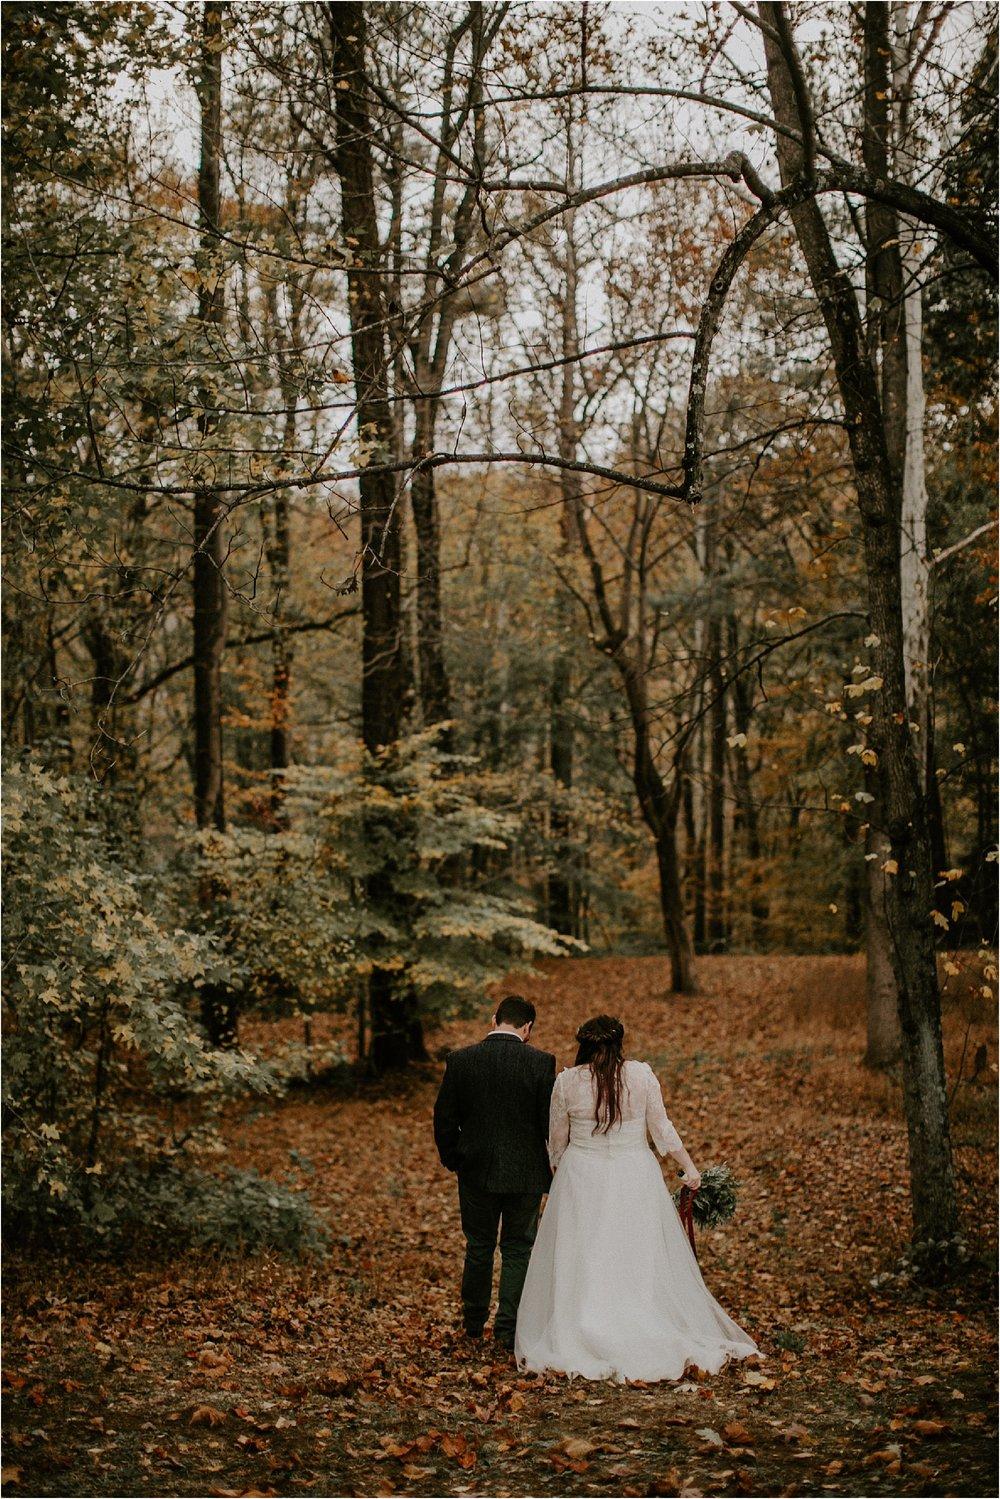 Sarah_Brookhart_Baltimore_Wedding_Photographer_0047.jpg